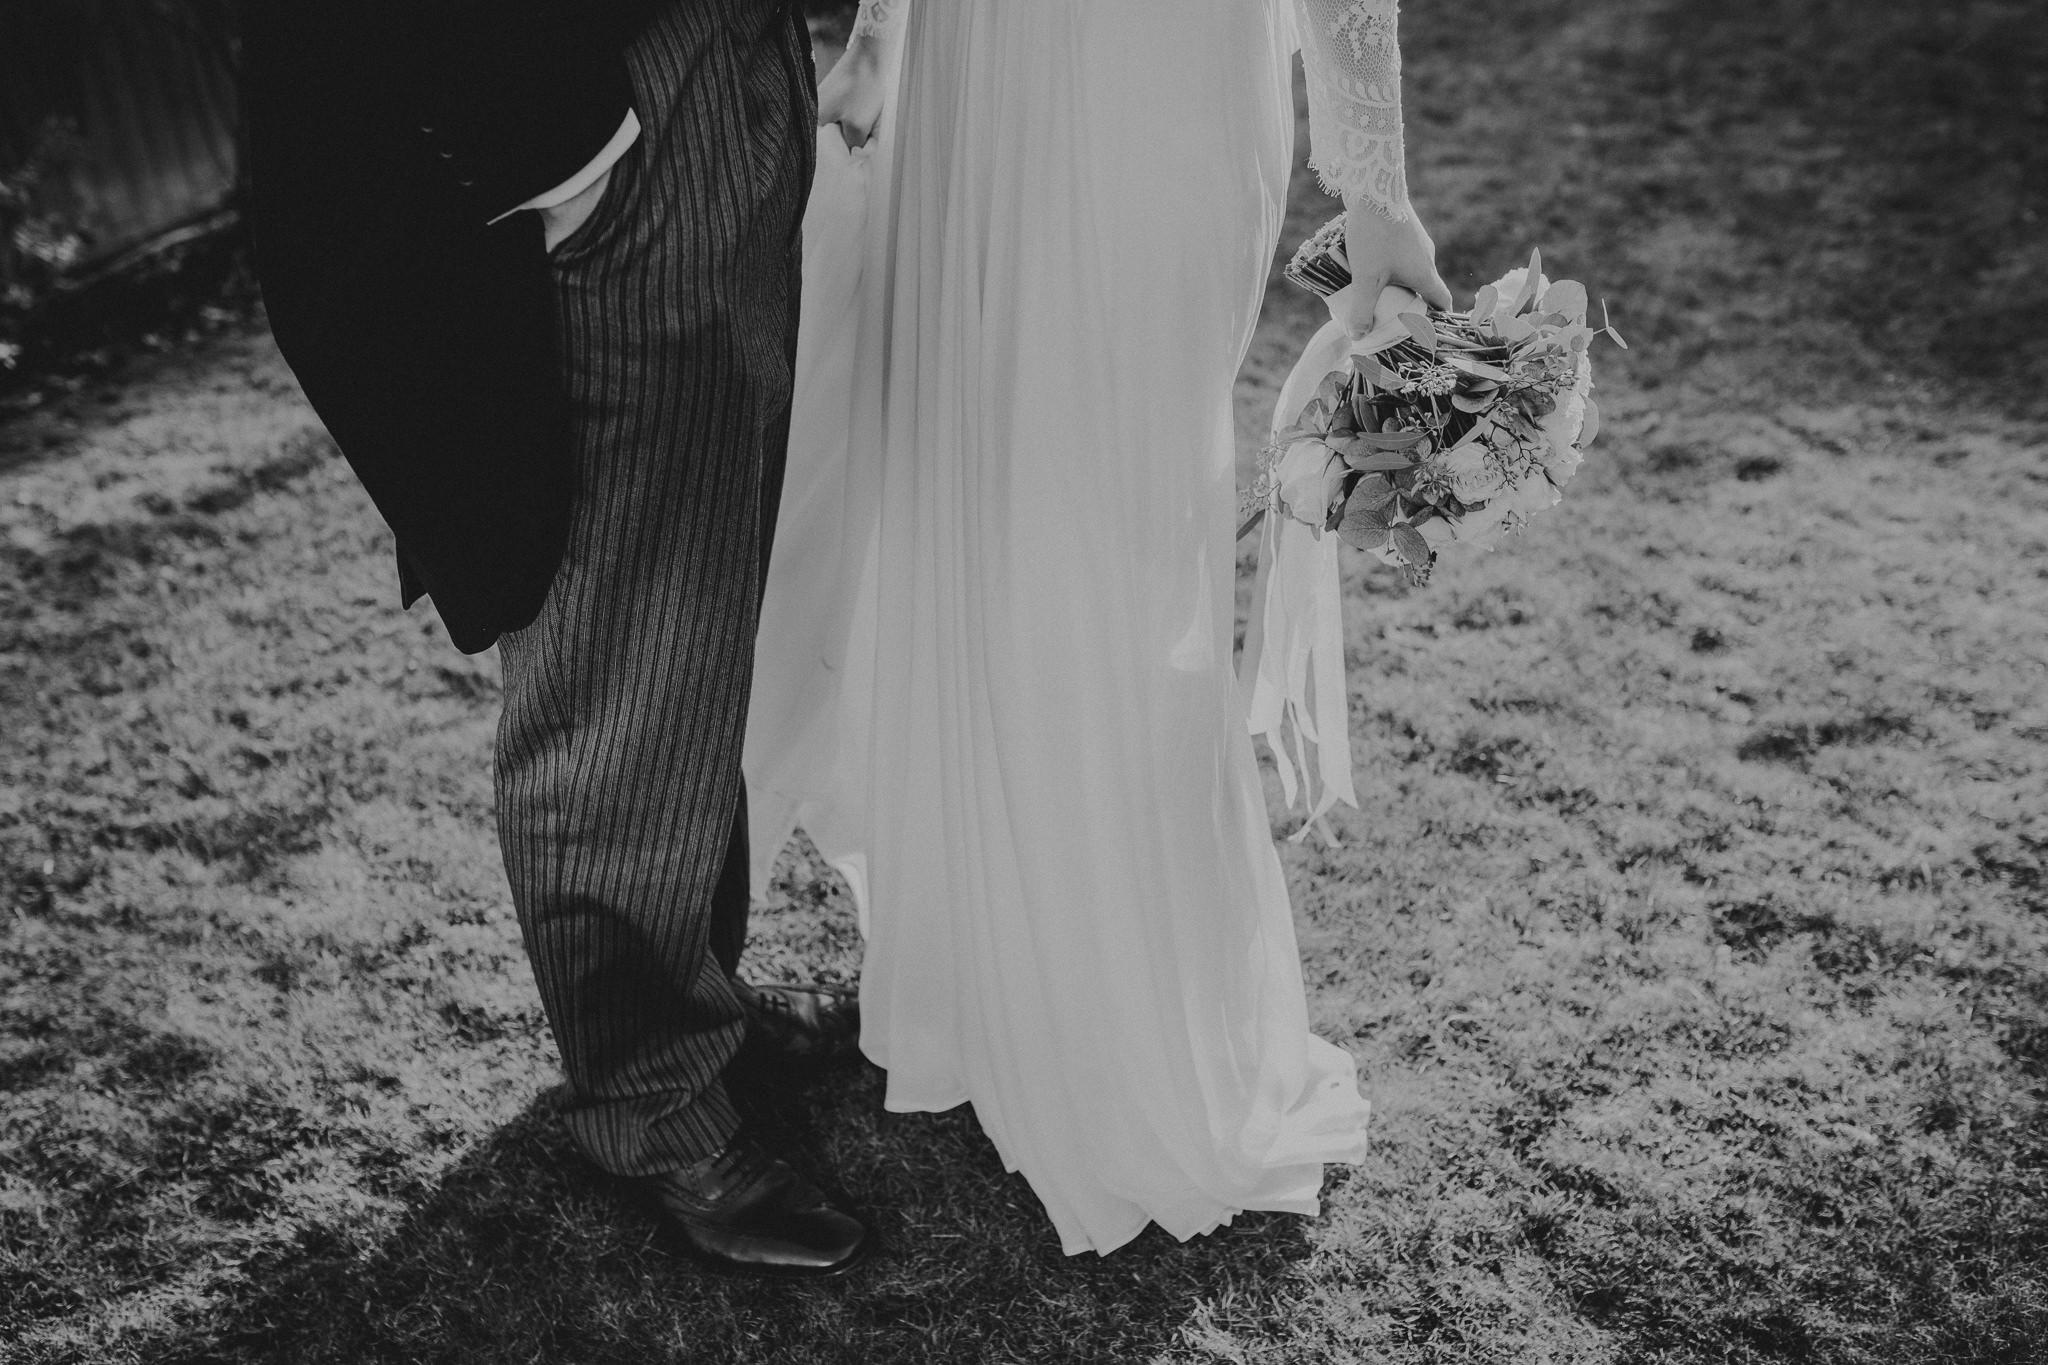 hampstead_wedding_photography_kate_gray-13.jpg